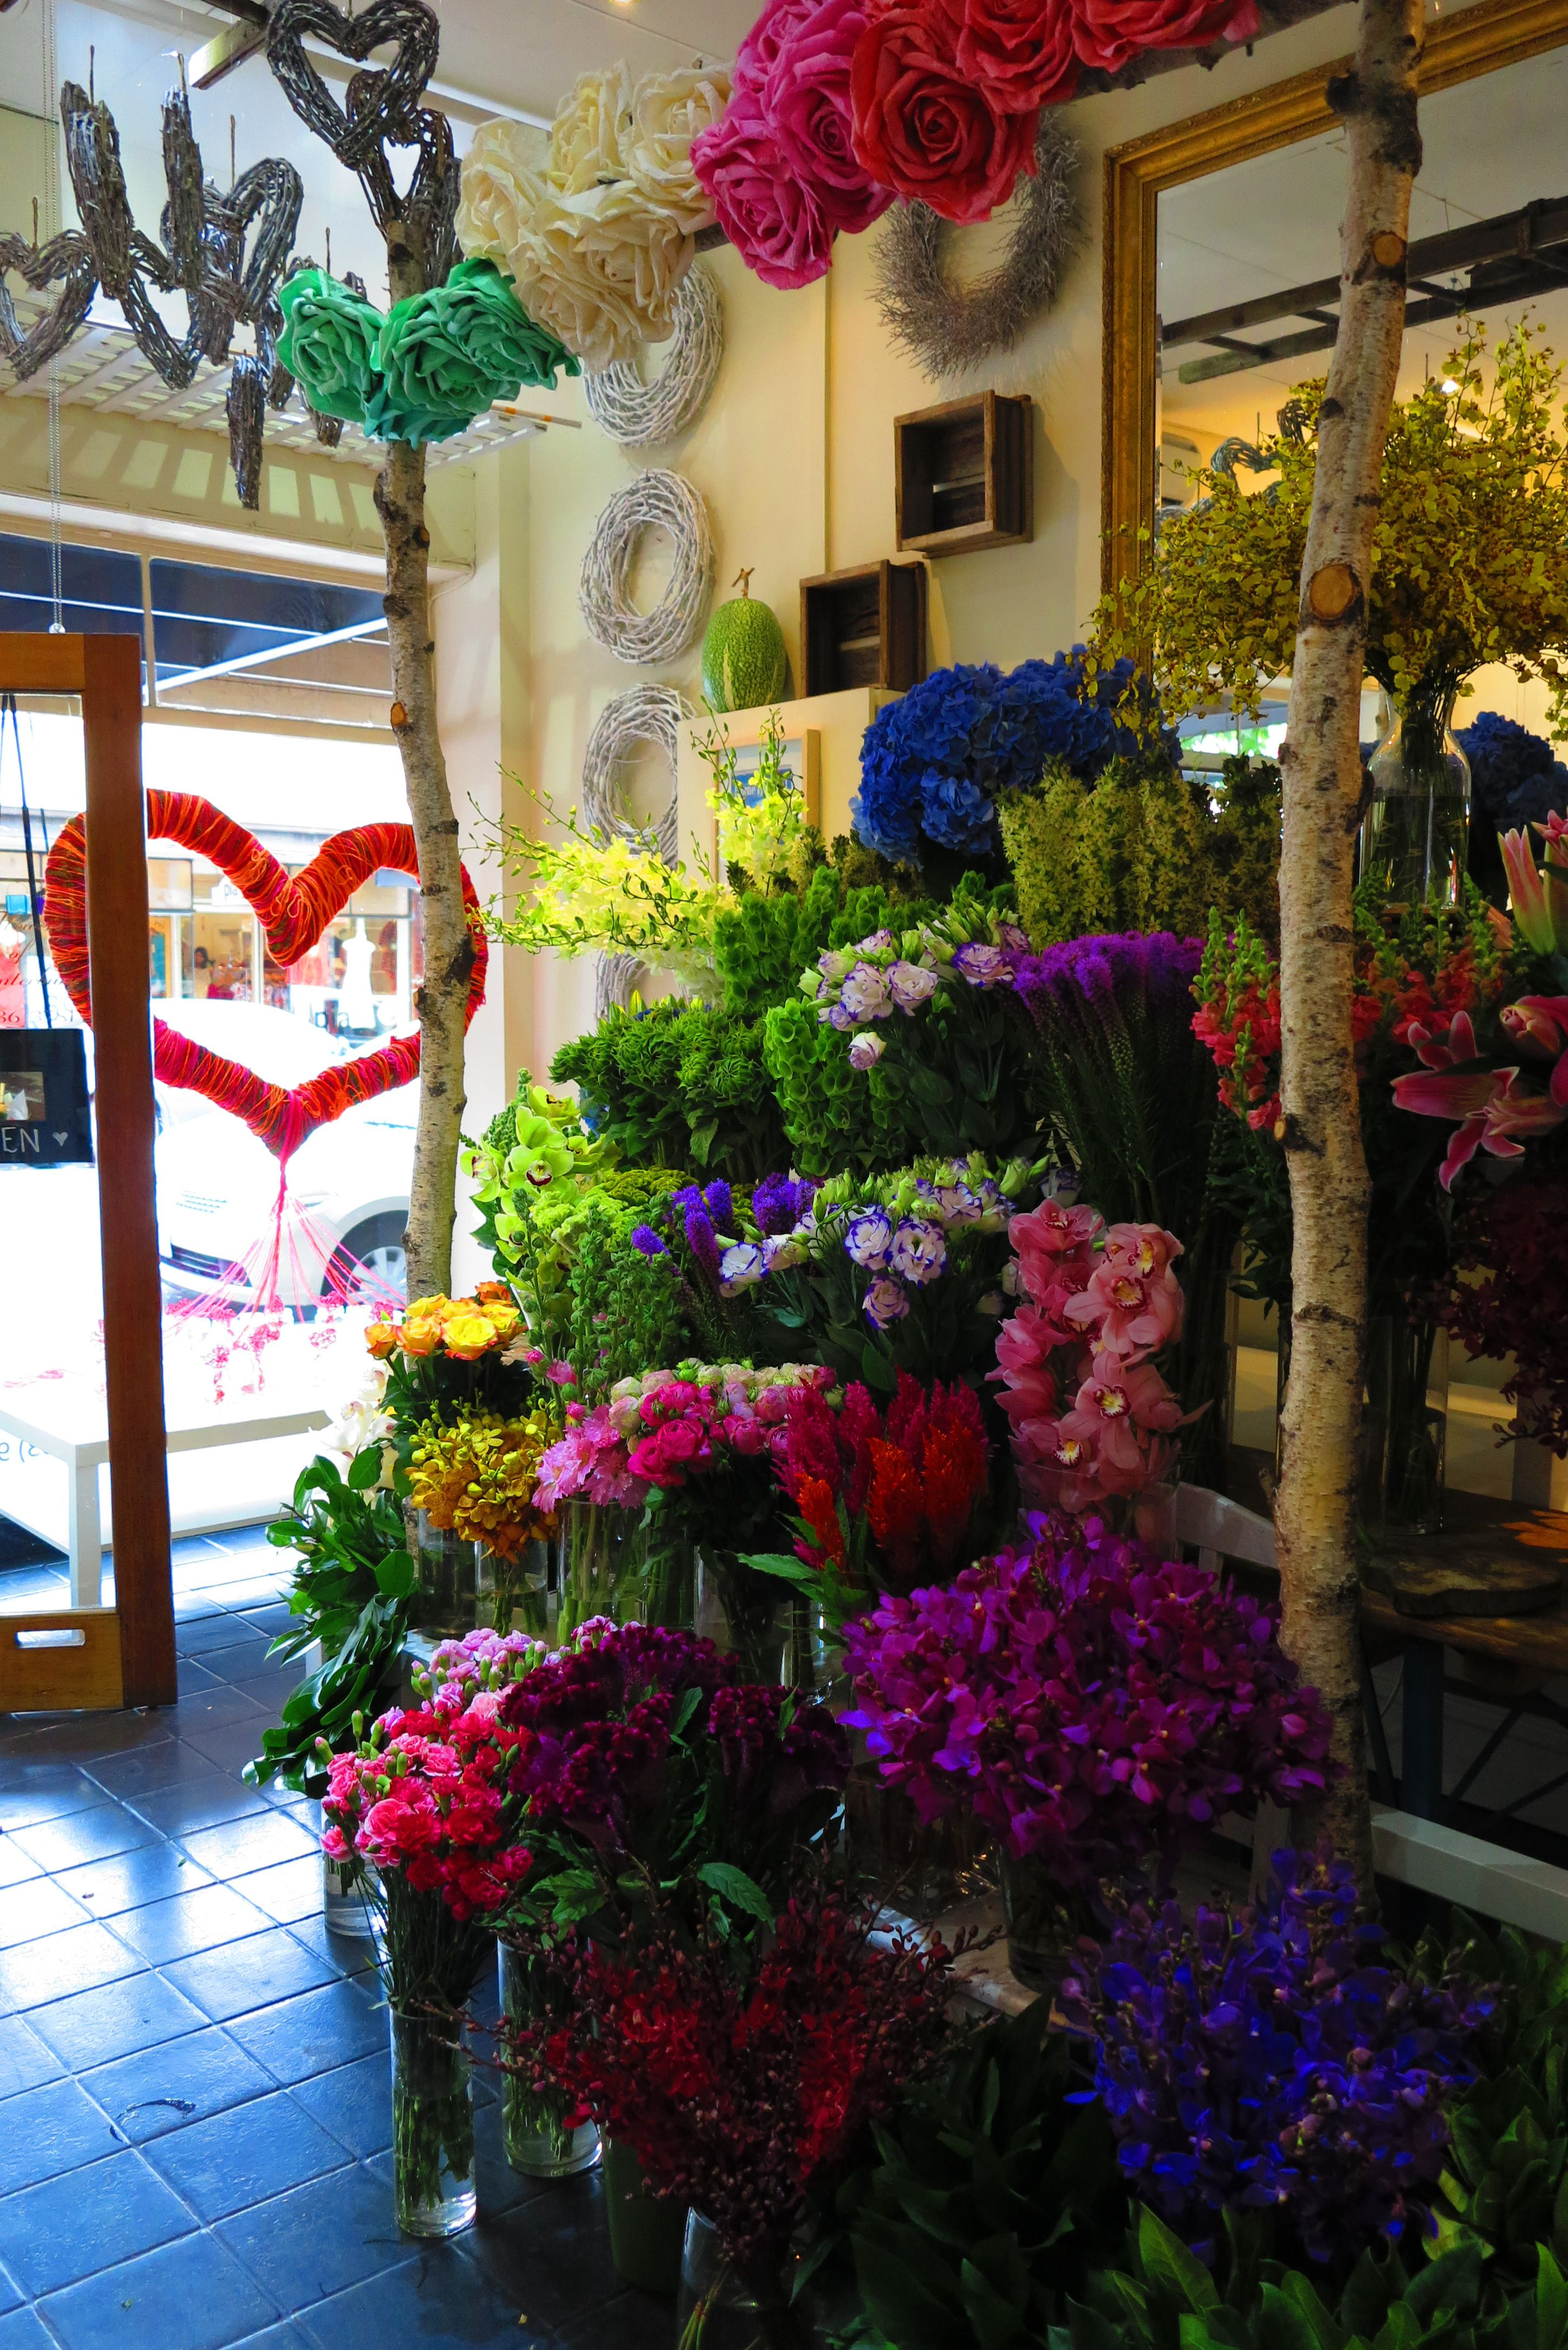 Flowers of canterbury shop display florist shop in